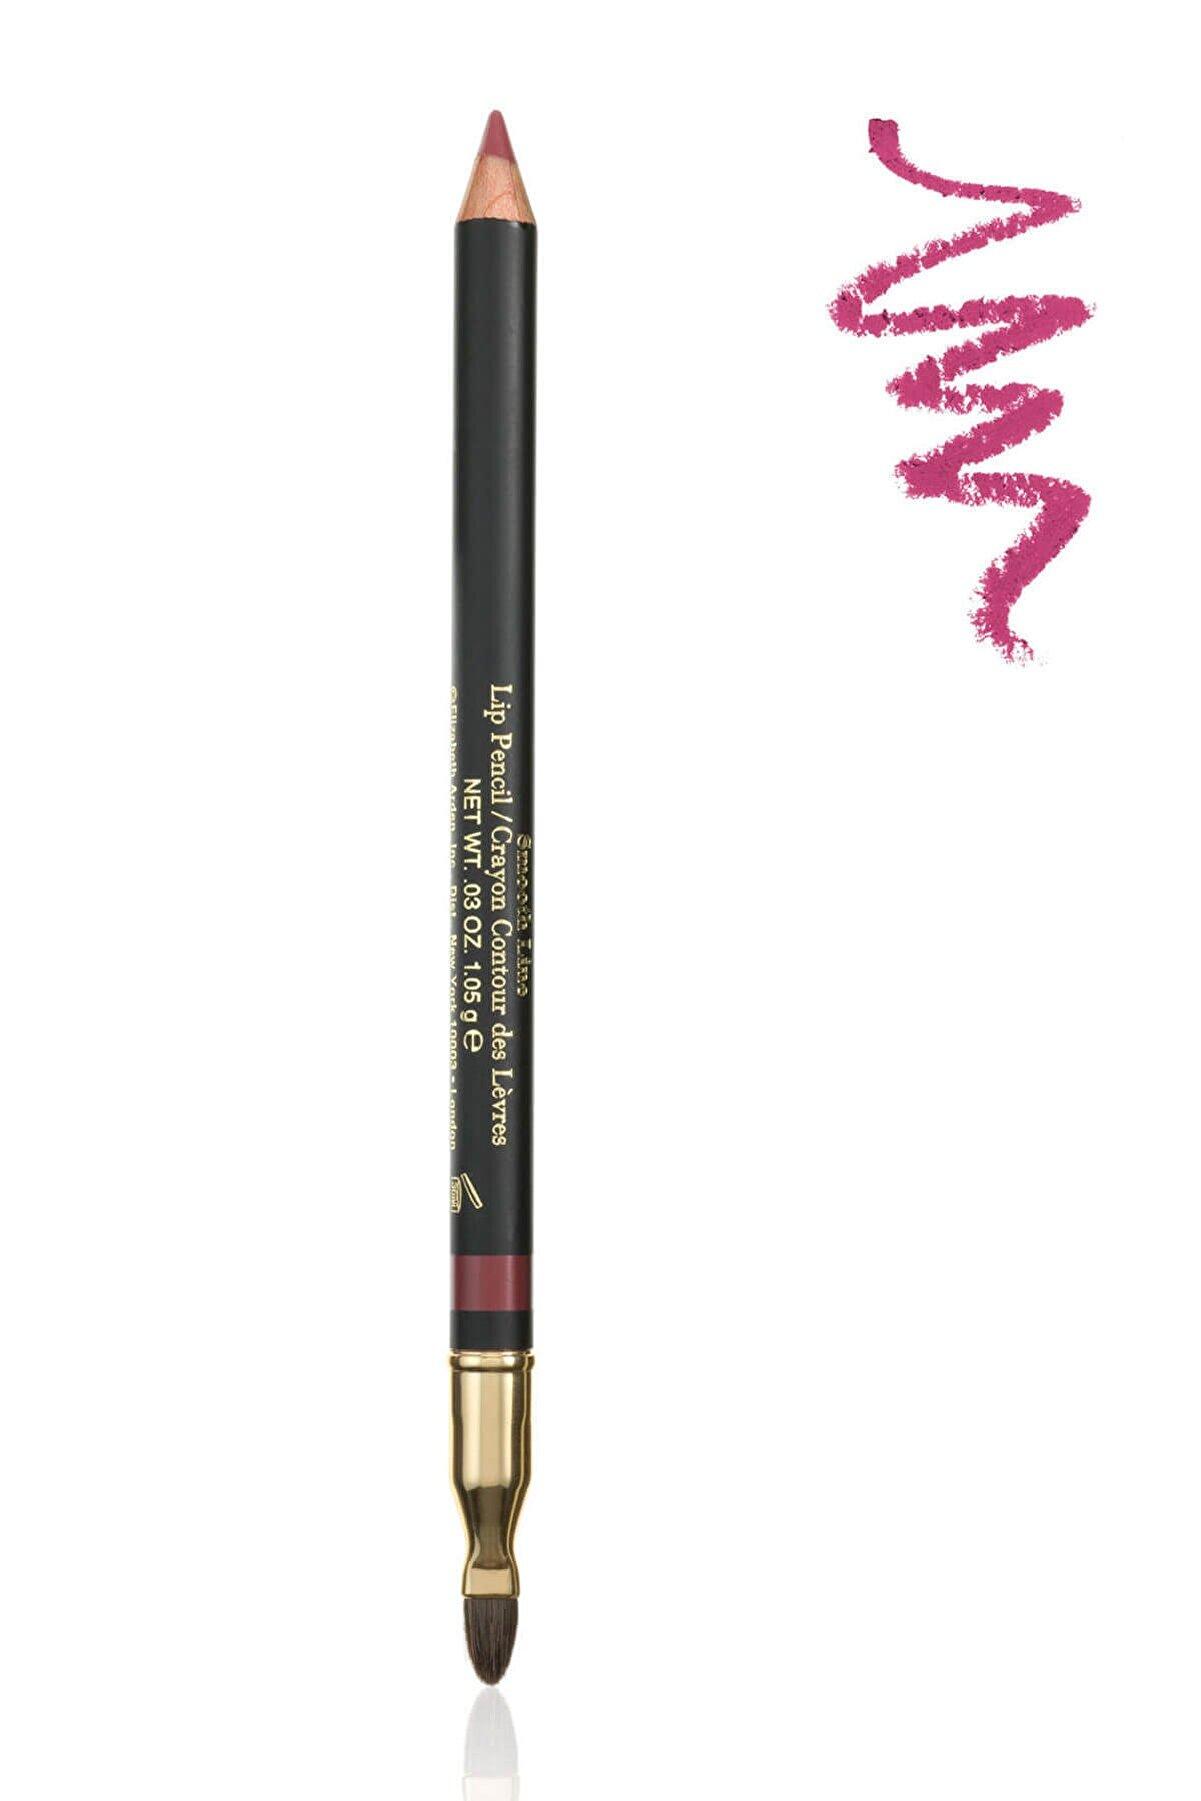 Elizabeth Arden Dudak Kalemi - Smooth Line Lip Pencil Orchid 06 1 g 085805003227